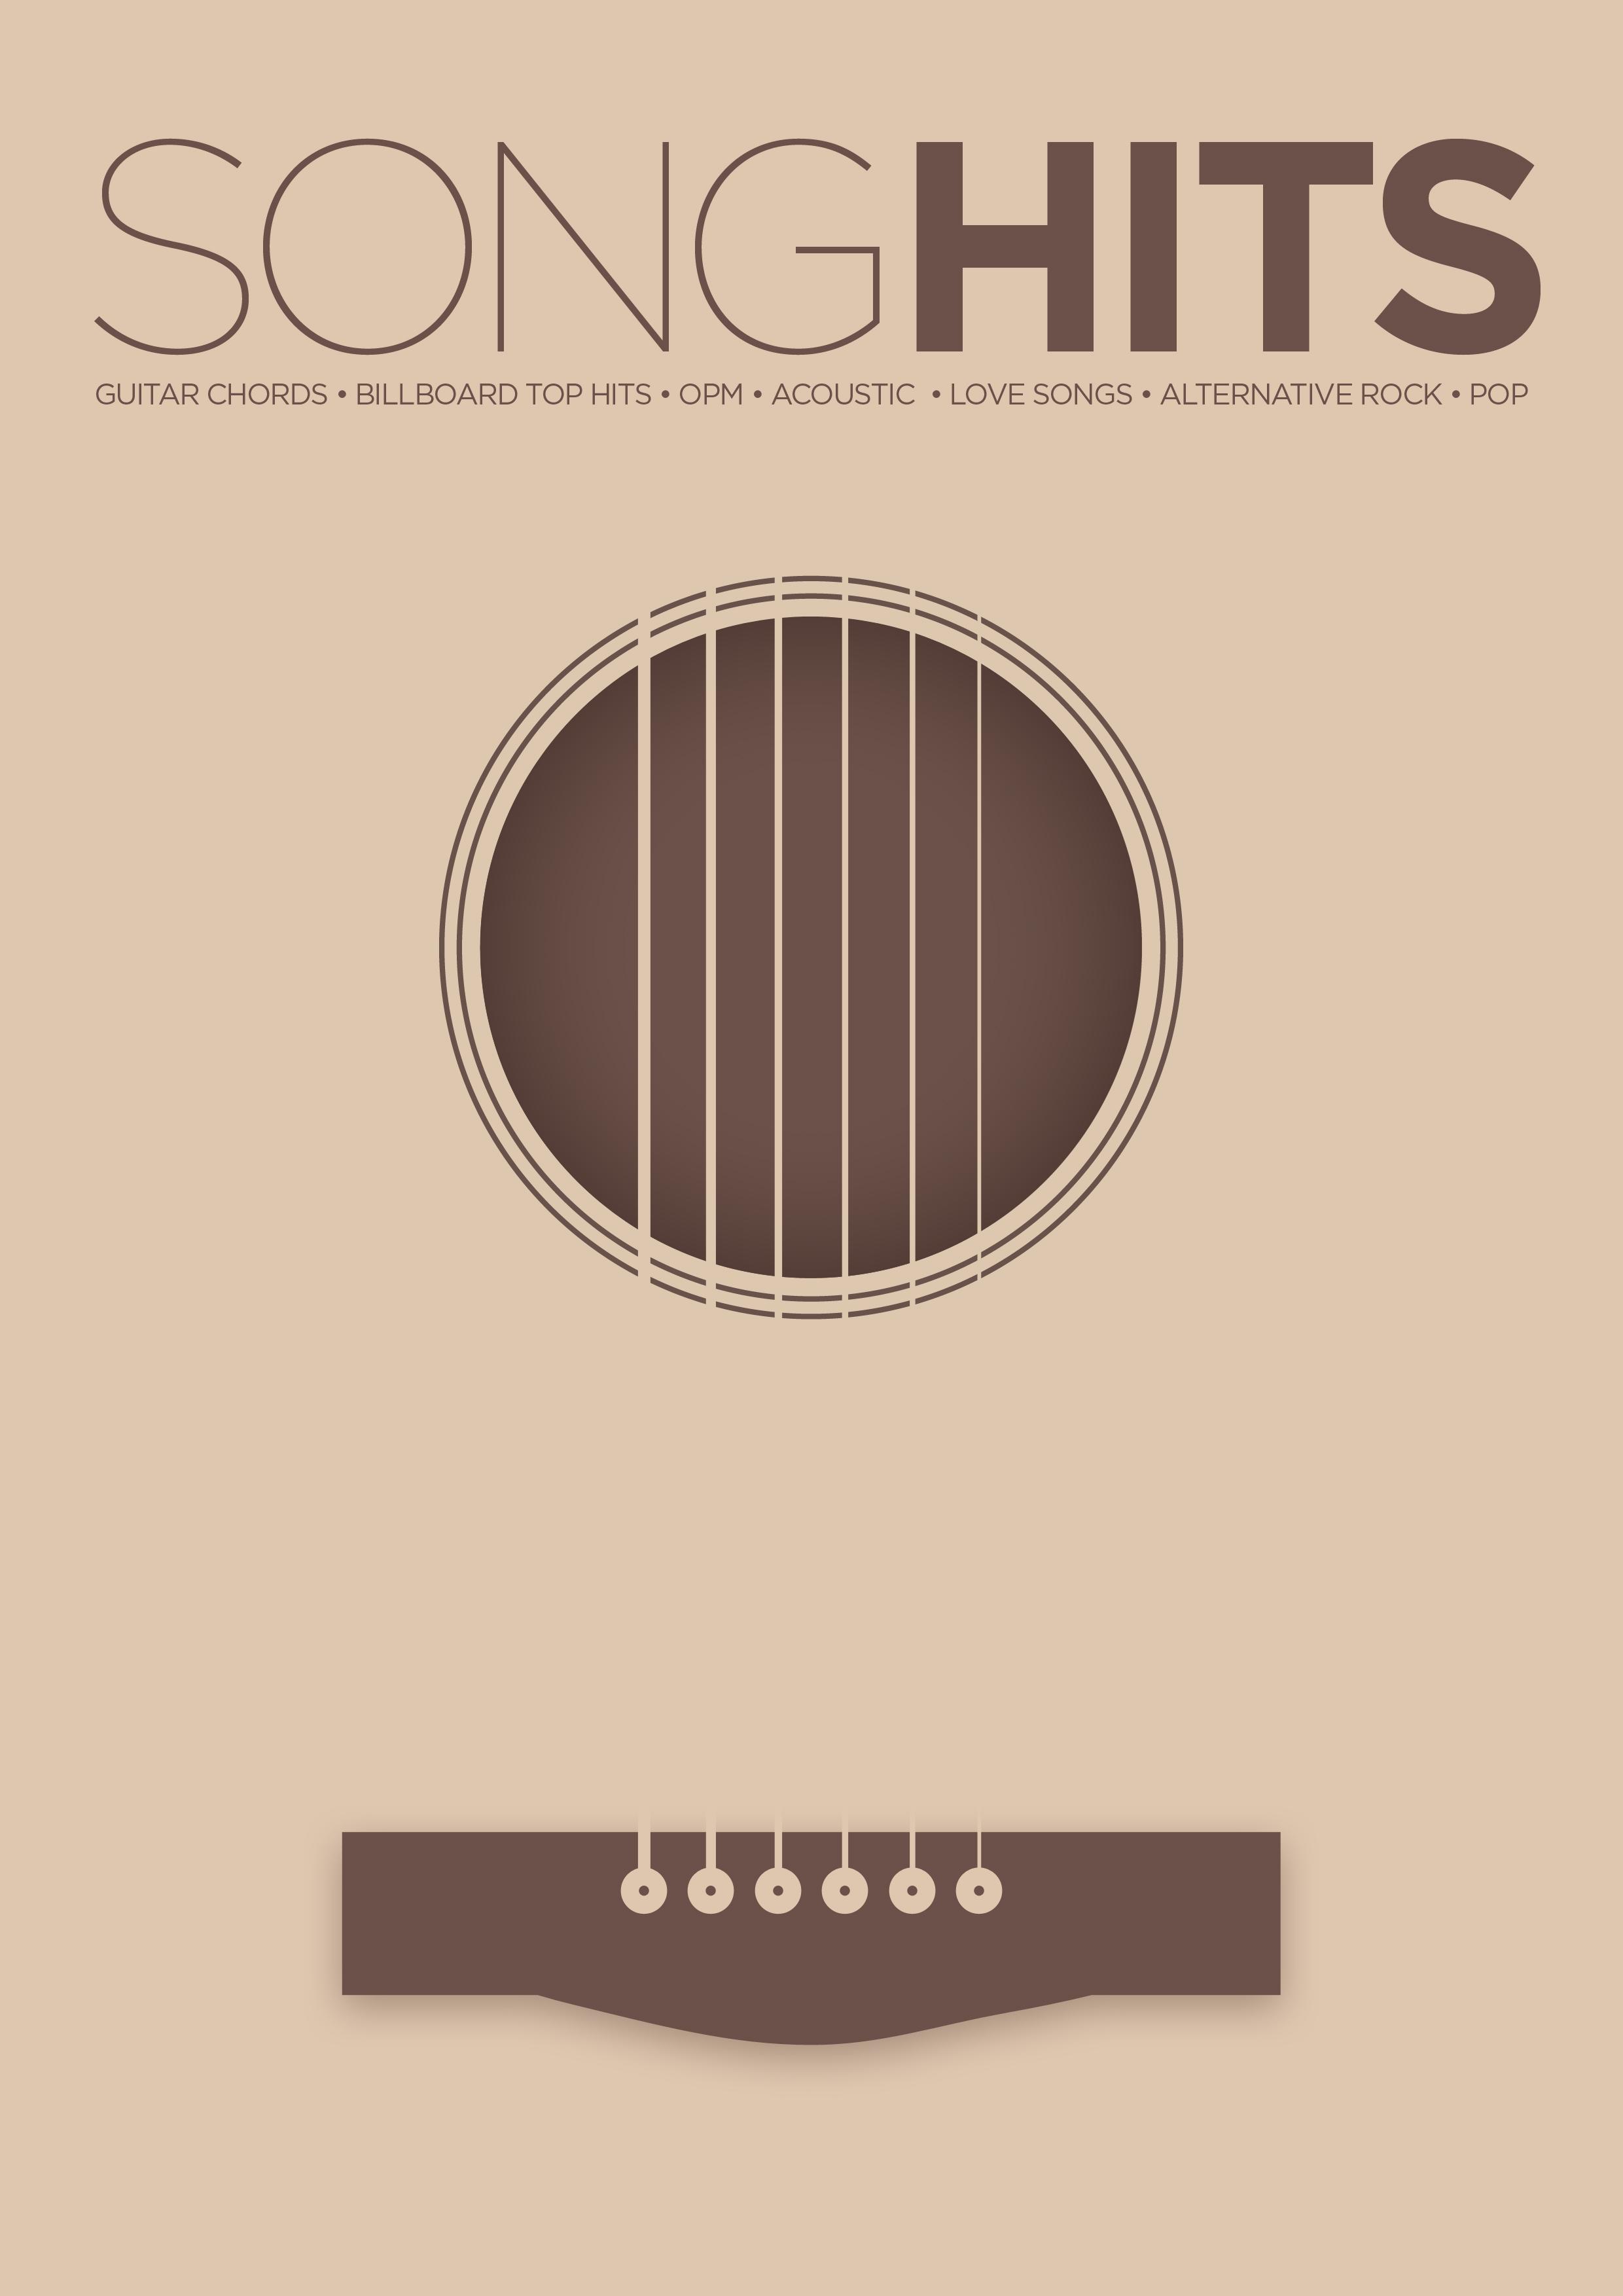 Song Hits, an Ebook by Aoanan Milson